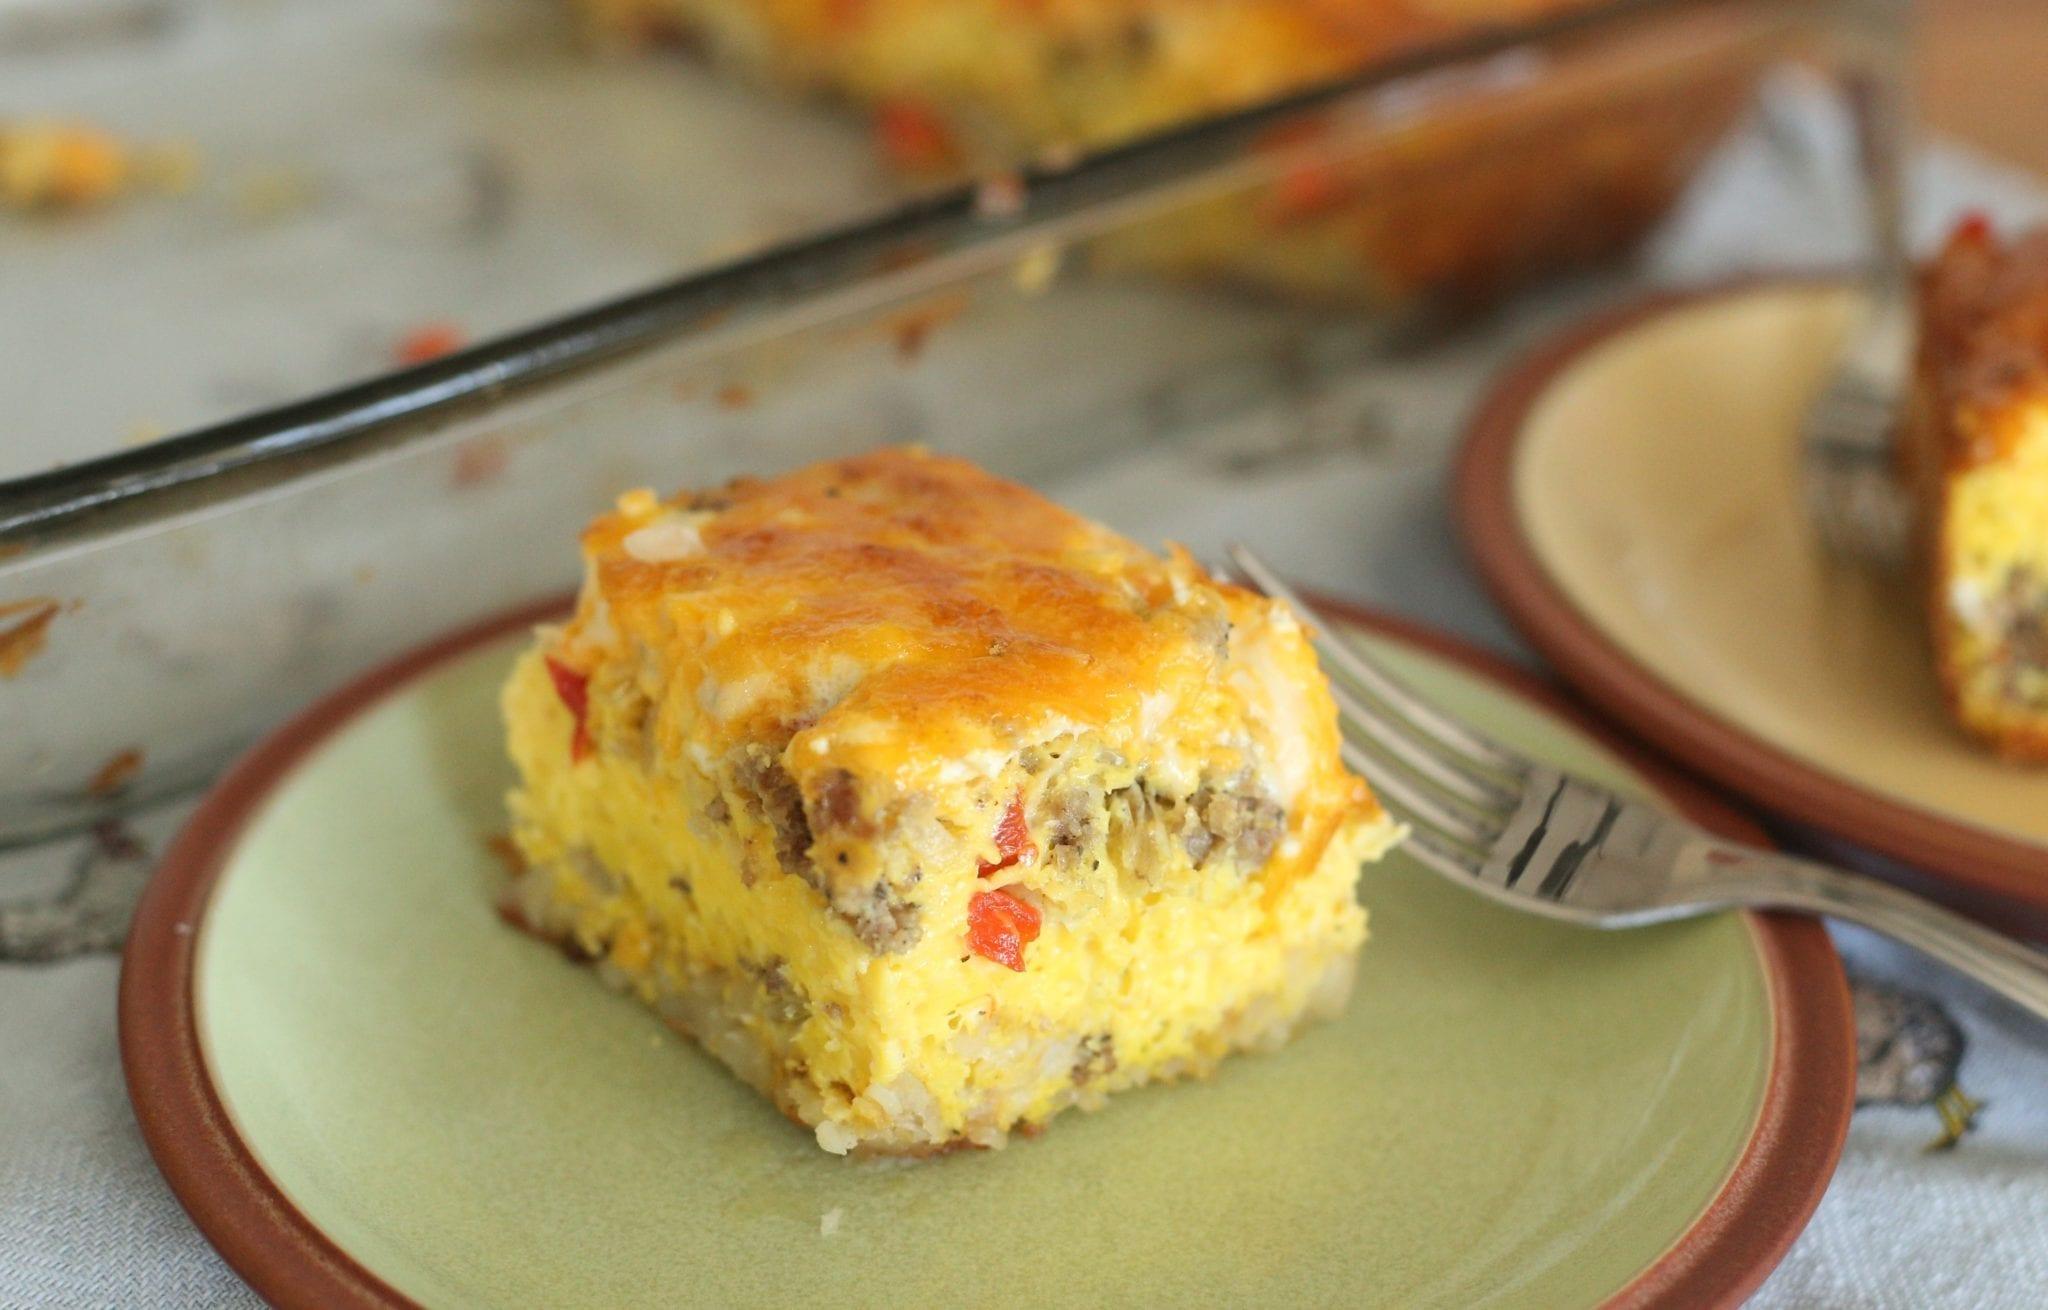 Nourishing and Easy Egg Casserole